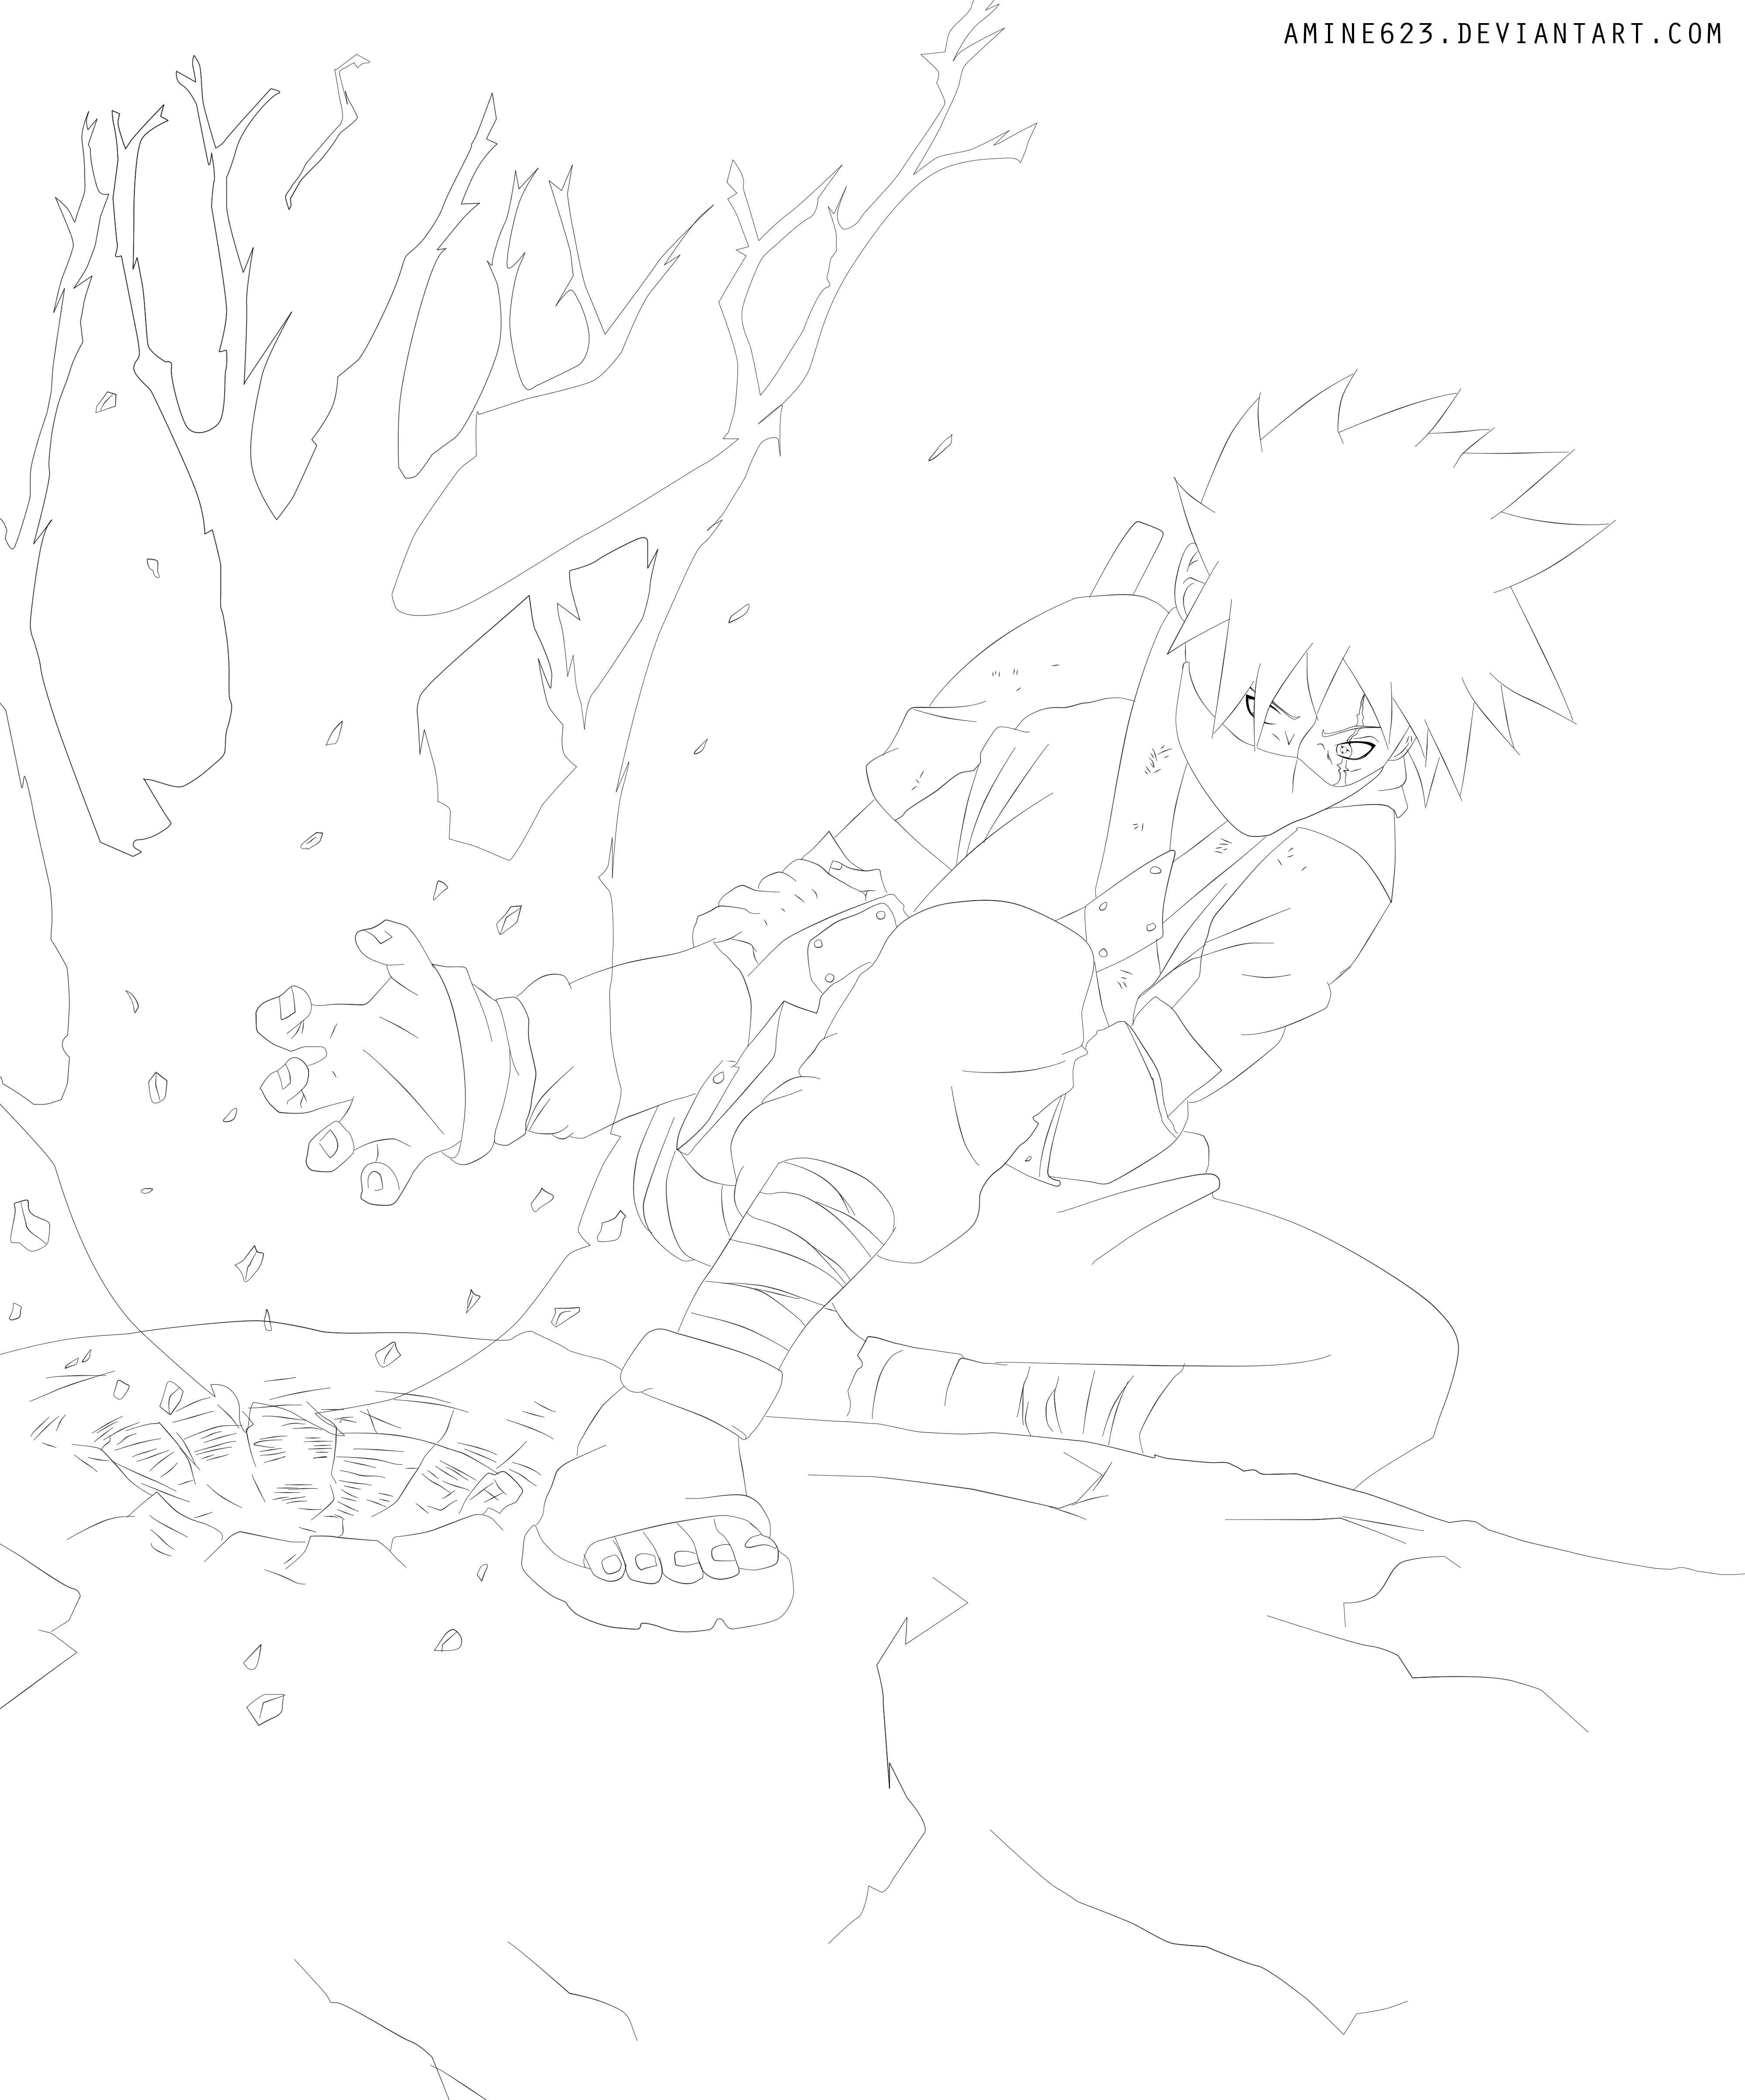 Kakashi Lineart : Kakashi gaiden lineart by ironizer on deviantart